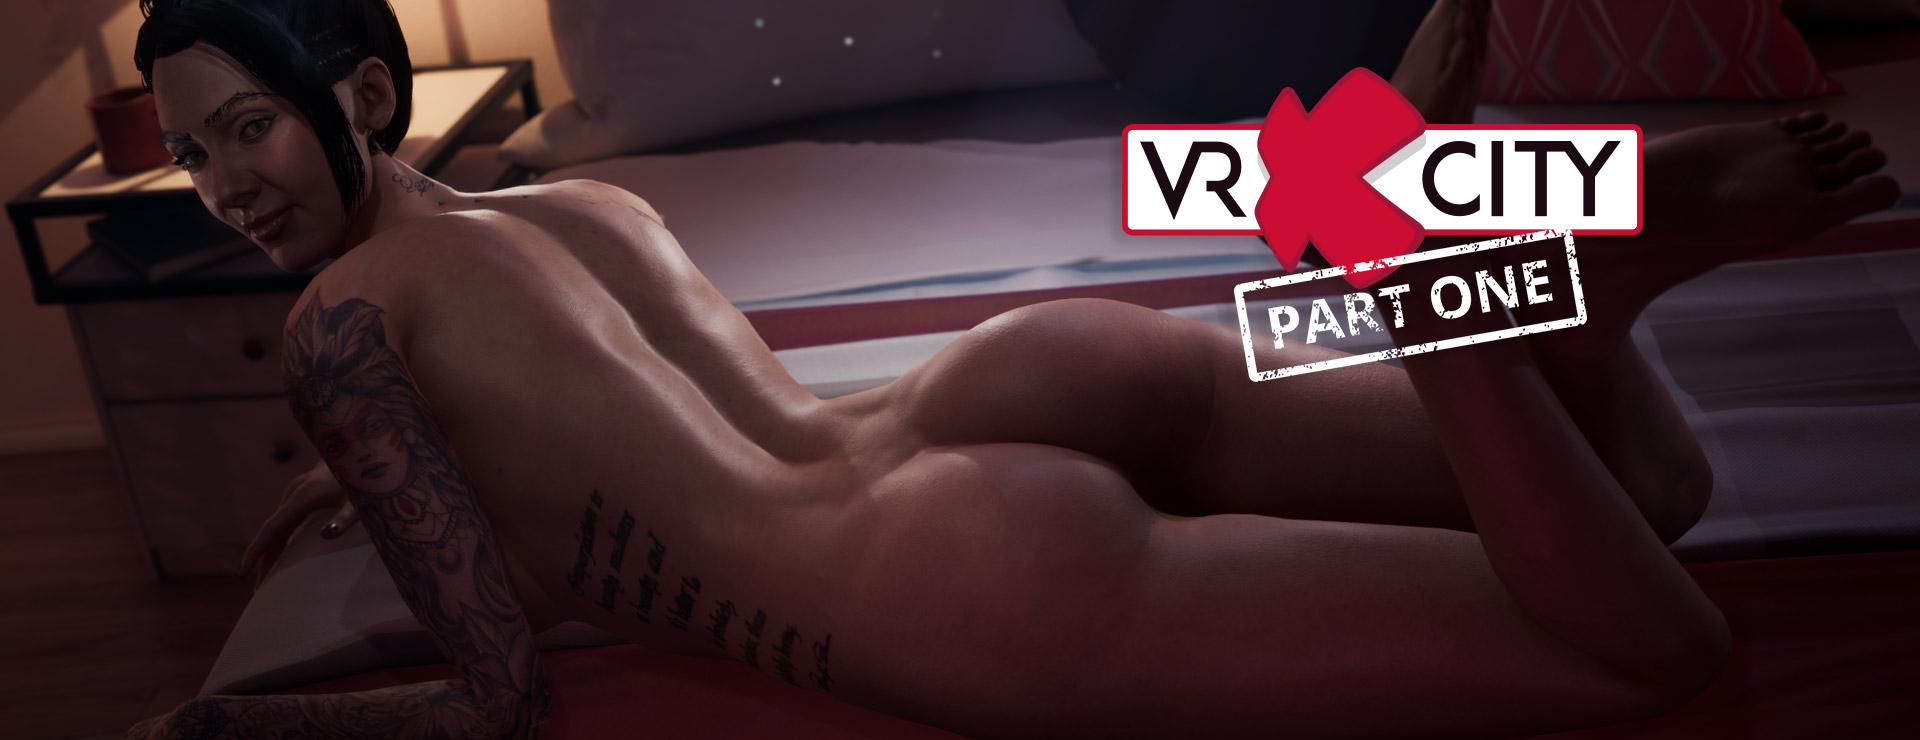 vrXcity - Adventure Game